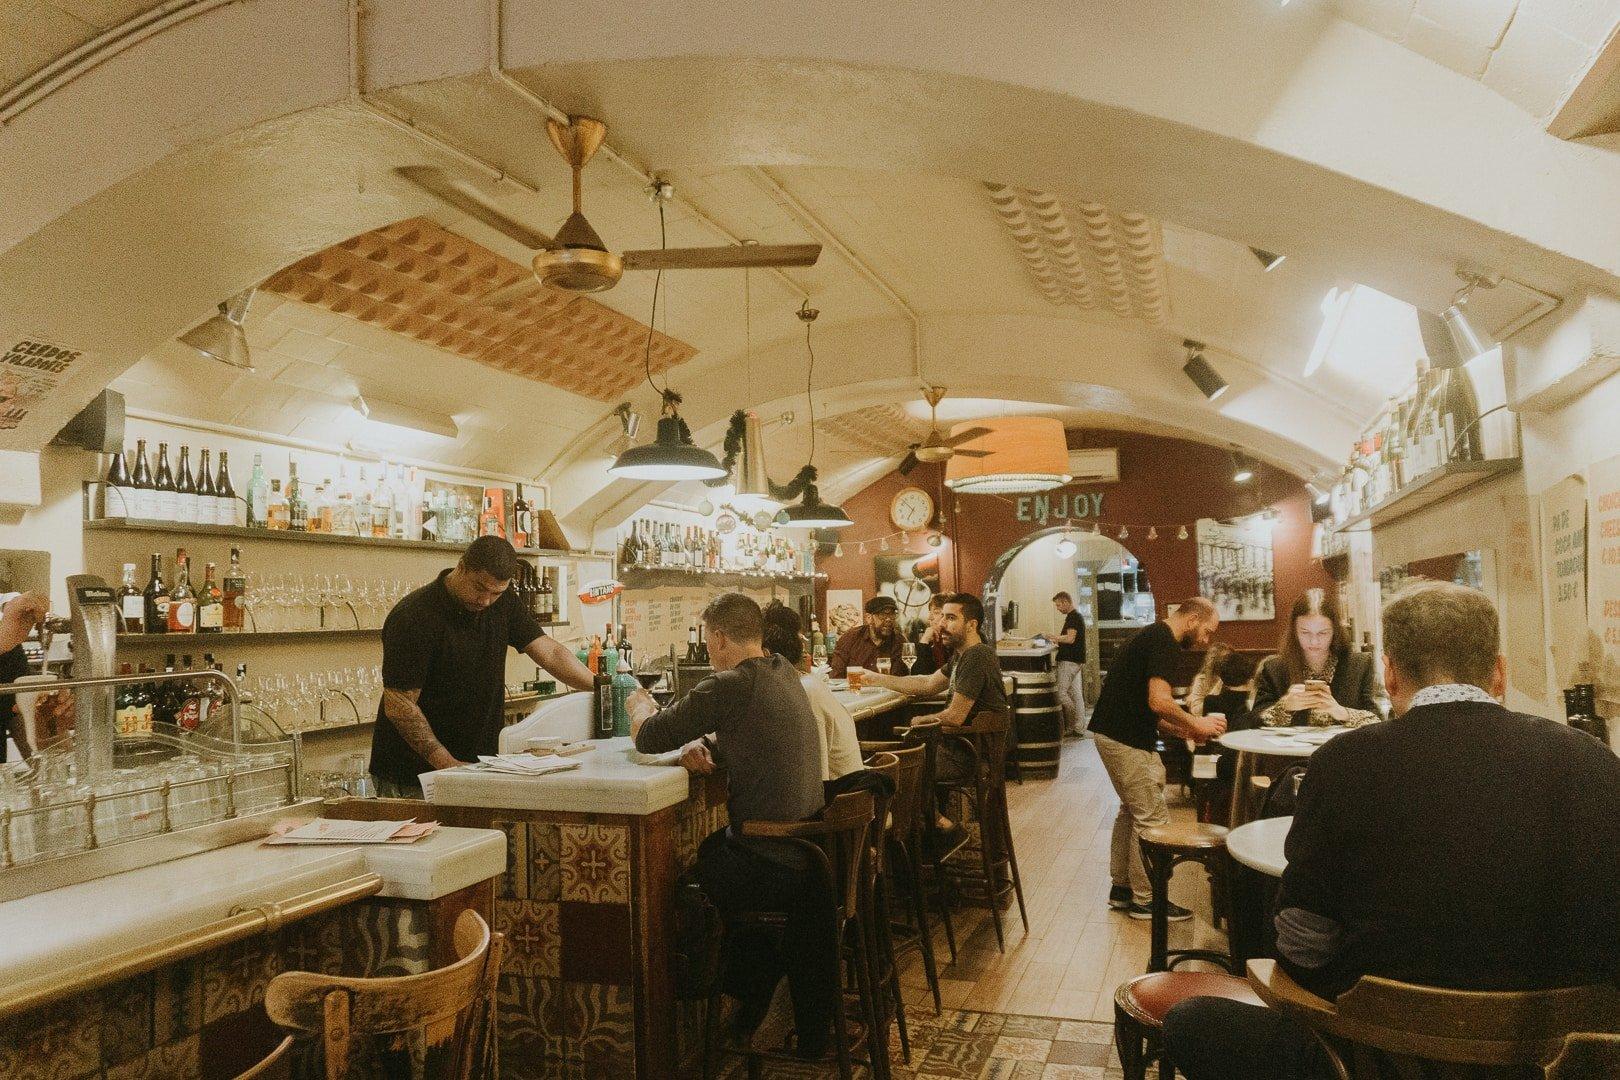 bar del pla, a must eat at restaurant in Barcelona, Spain